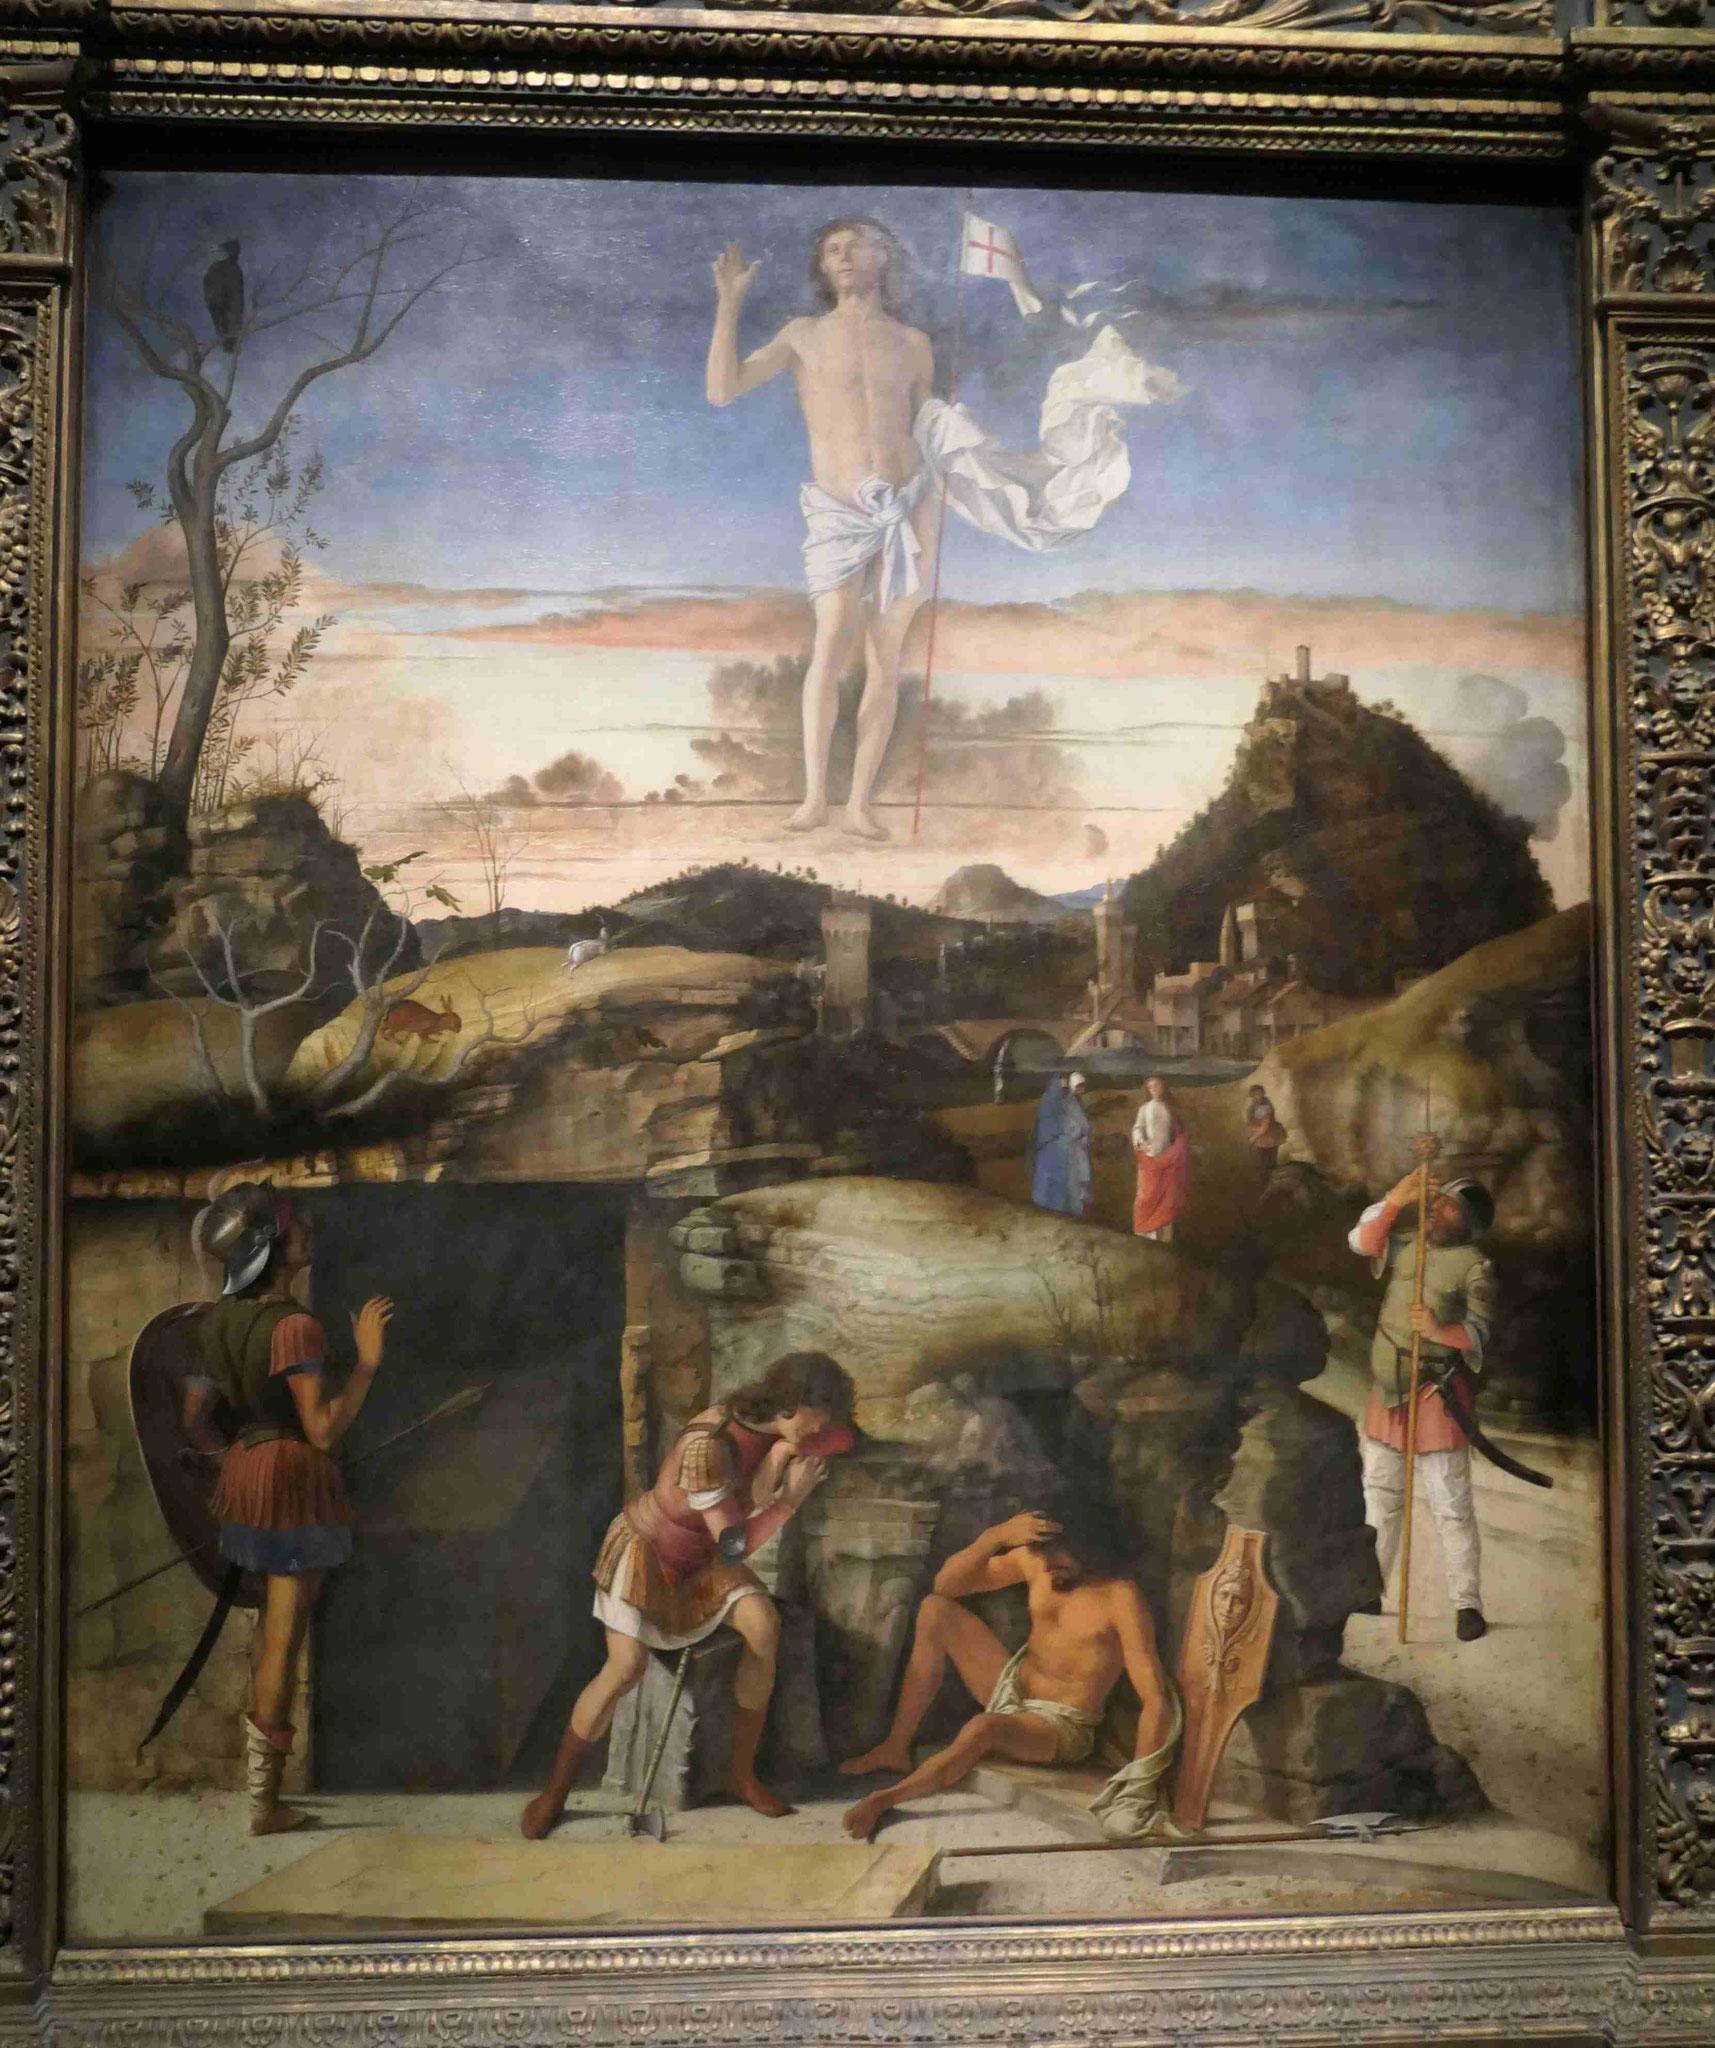 Giovanni Bellini, Die Auferstehung Christi, 1475/79, Gemäldegalerie Berlin